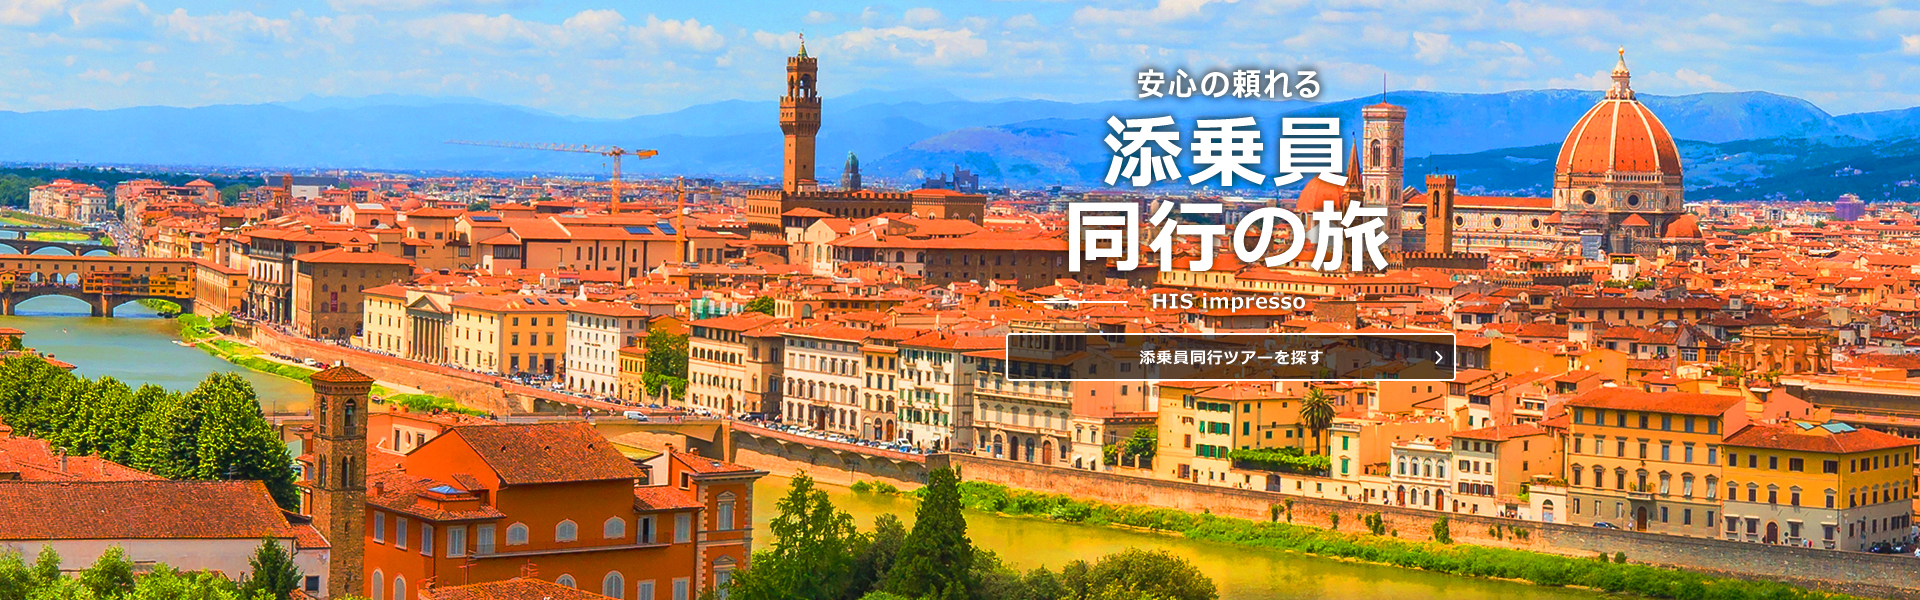 【H.I.S.】海外旅行の予約サイト(関西発)